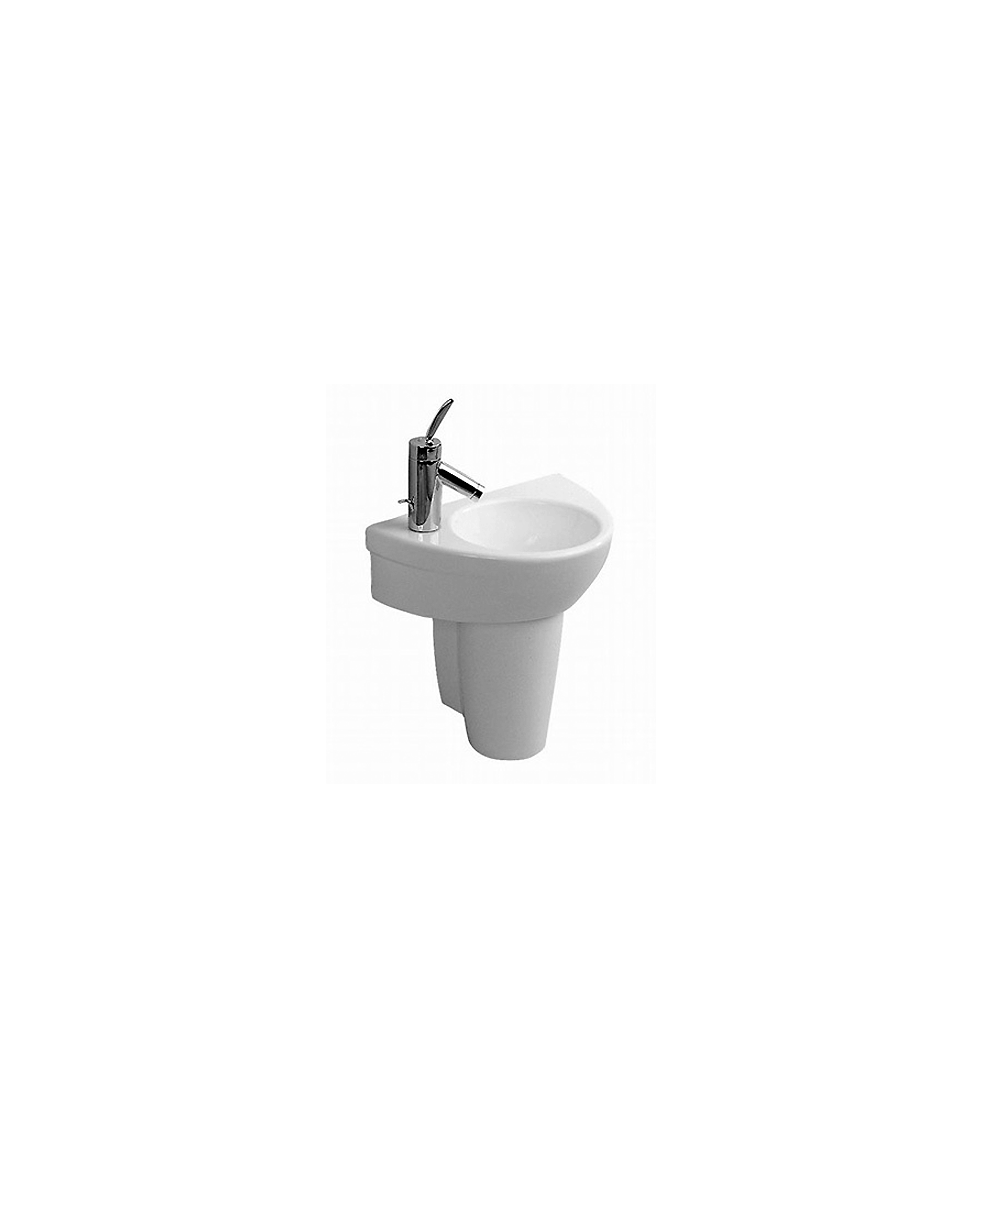 Starck 2 Cloakroom Washbasin